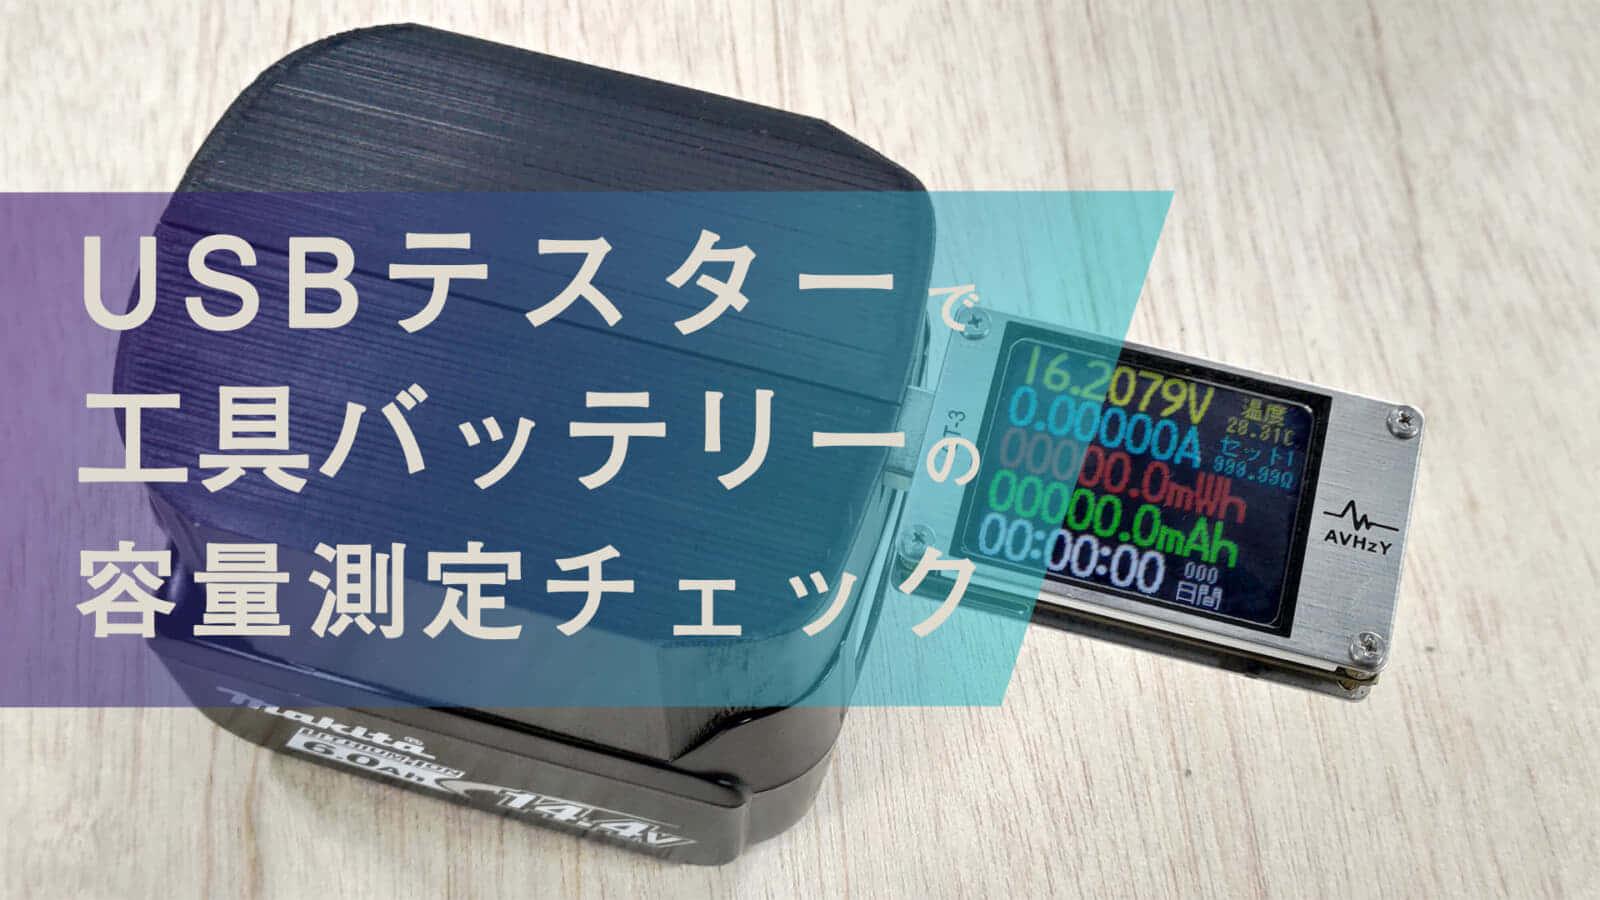 USBテスタを電動工具バッテリーの容量測定チェッカーとして使う